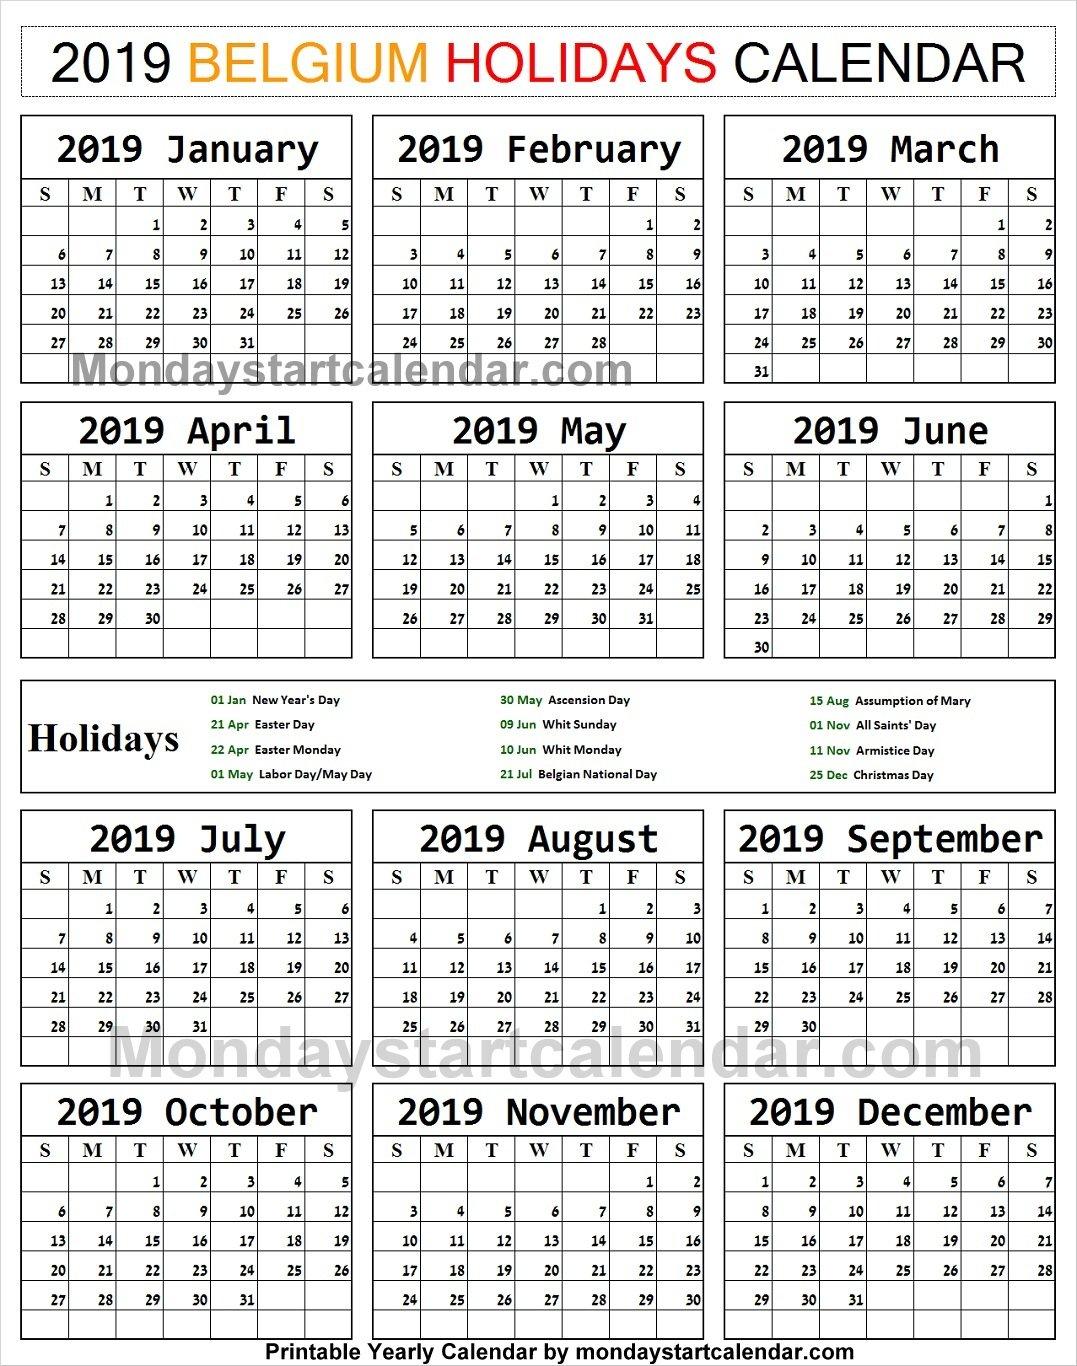 2019 Bank Holidays Belgium Calendar   2019 Austria Calendar Templates Calendar 2019 Belgium